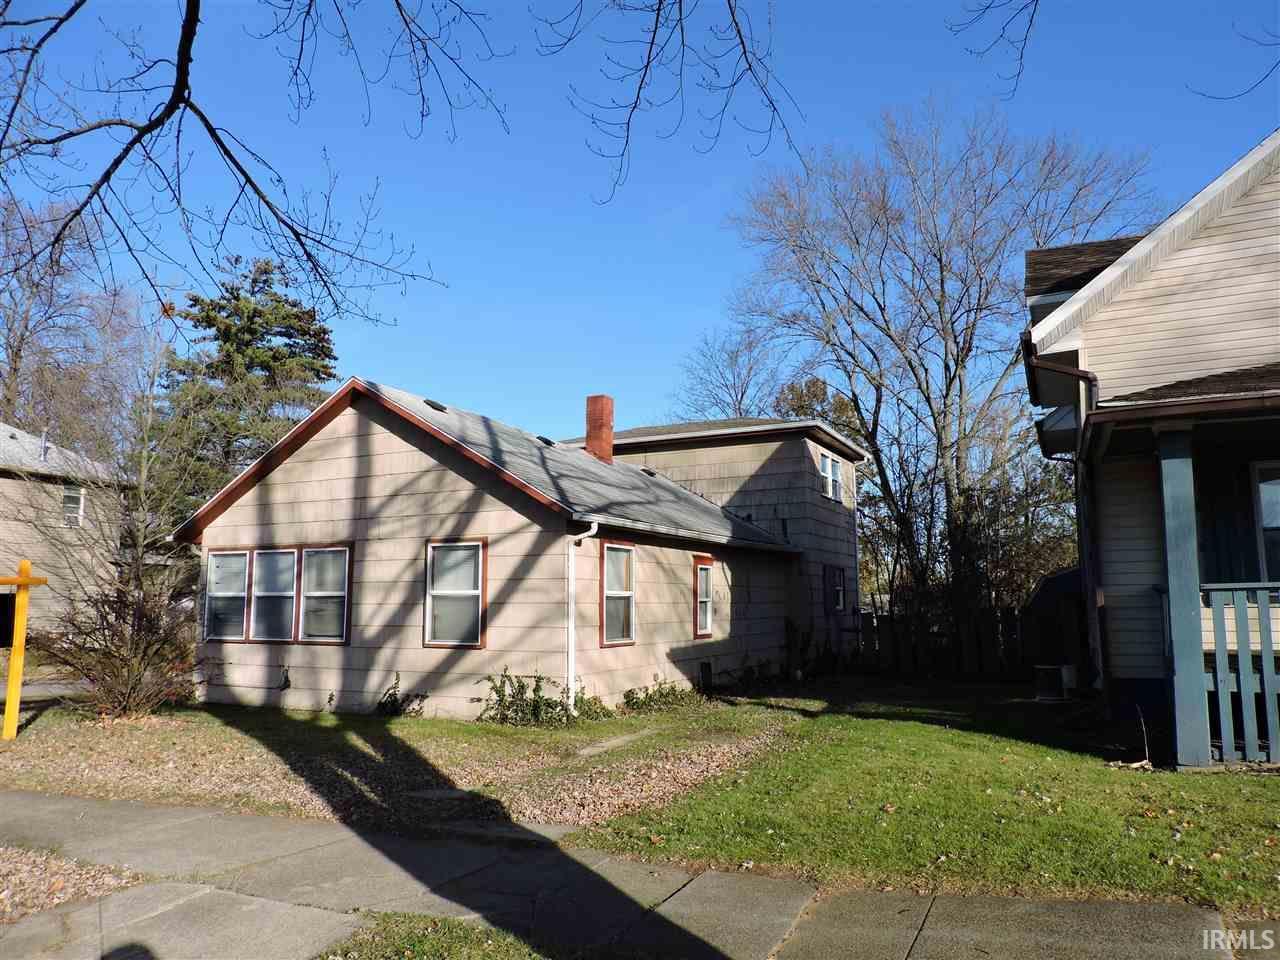 1802 S Twyckenham South Bend, IN 46613